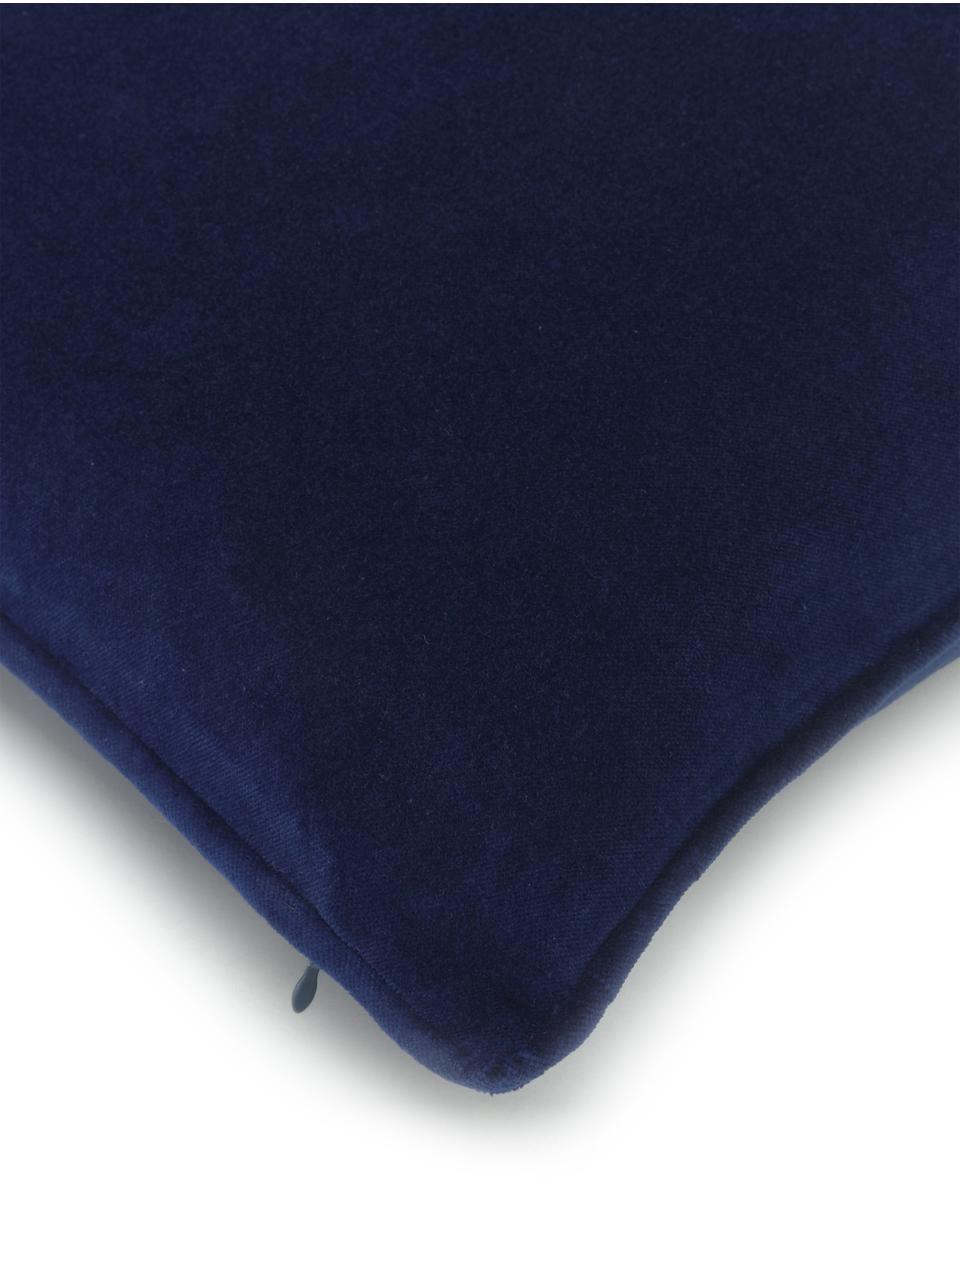 Einfarbige Samt-Kissenhülle Dana in Marineblau, 100% Baumwollsamt, Marineblau, 30 x 50 cm